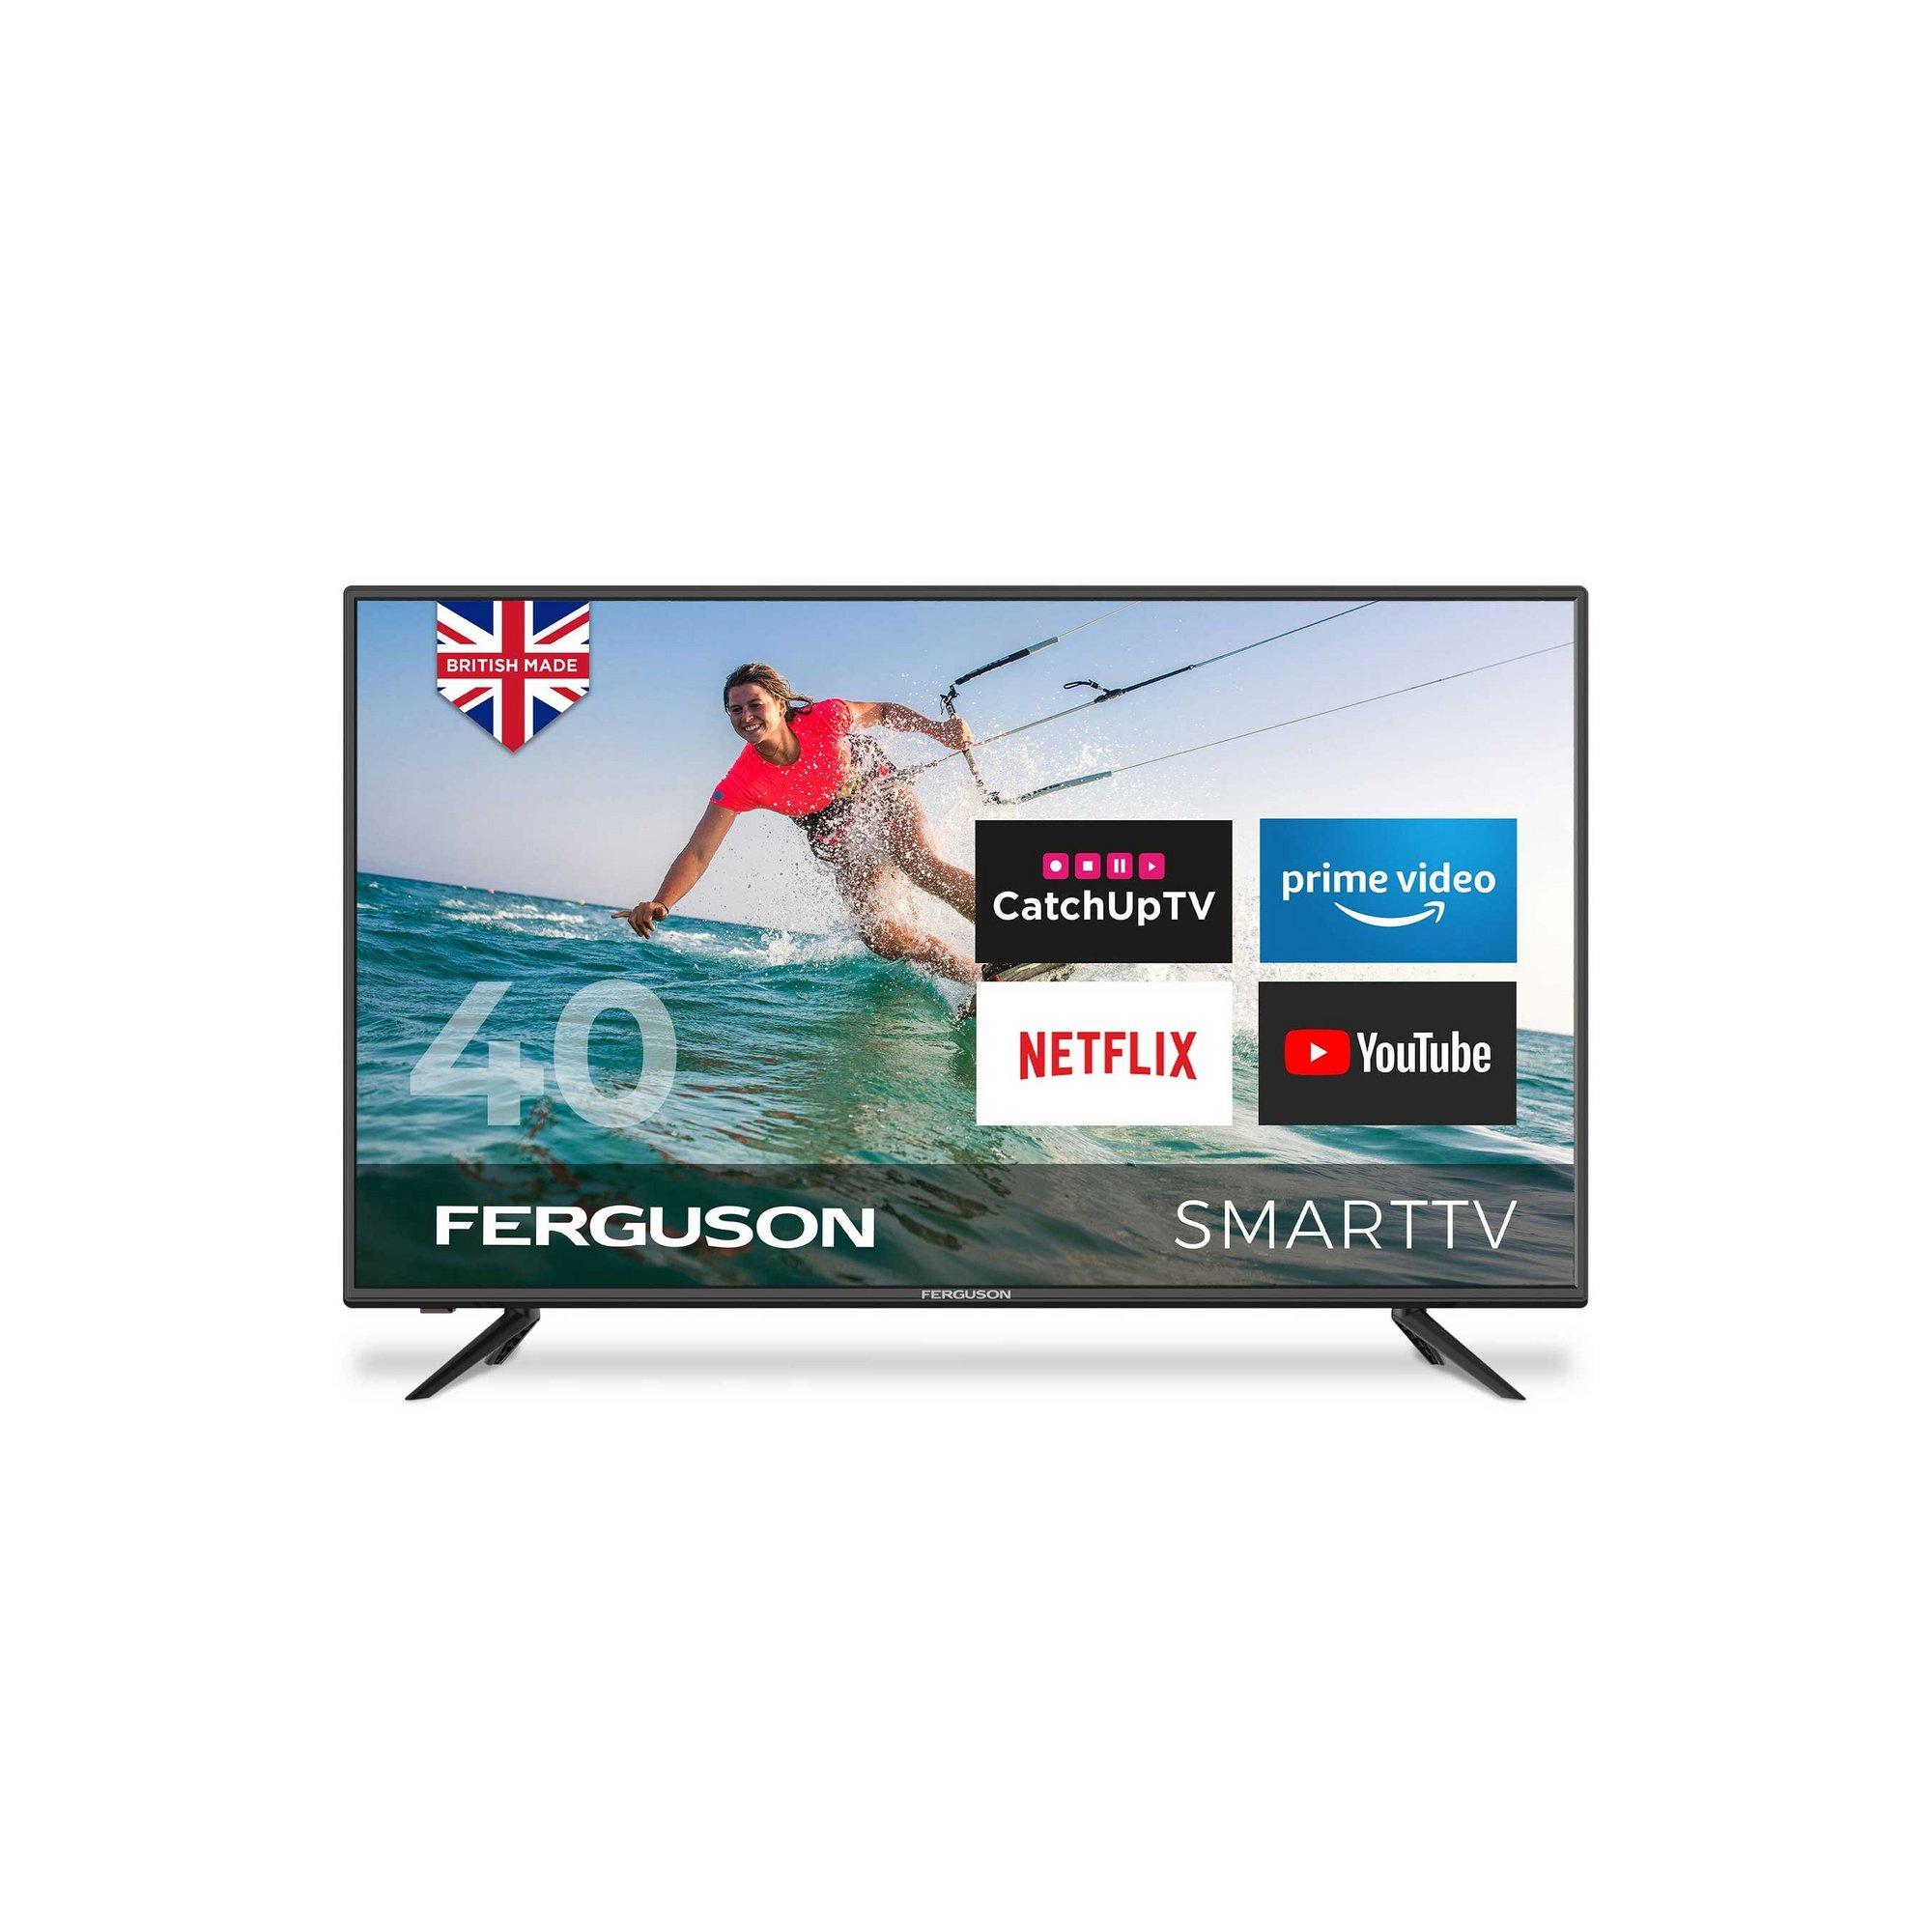 Image of Ferguson 40 Inch F4020RTS Full HD LED Smart TV with Wi-Fi